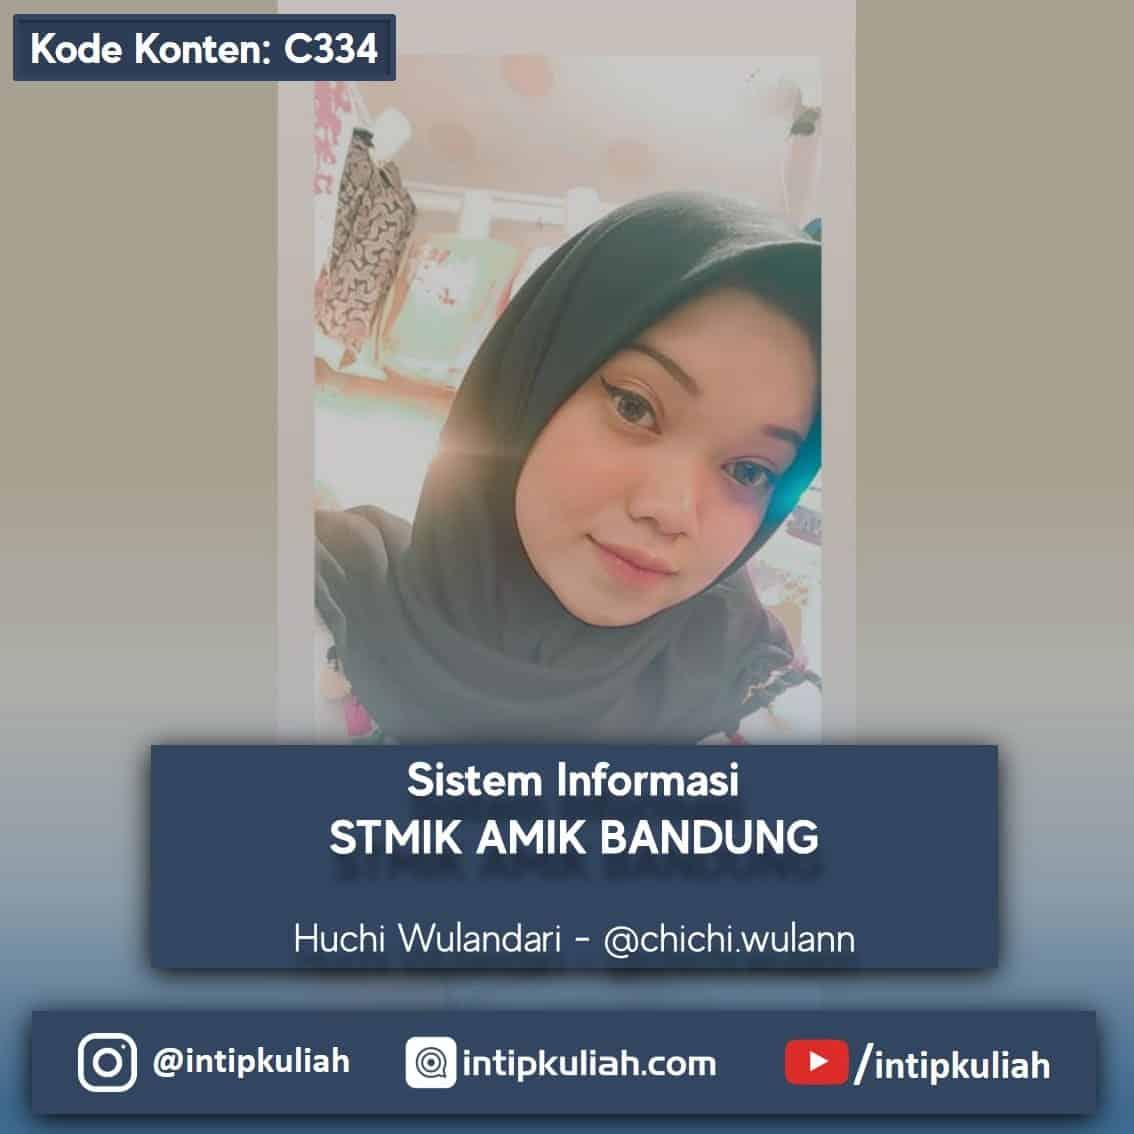 Sistem Informasi STMIK AMIK Bandung (Huchi)